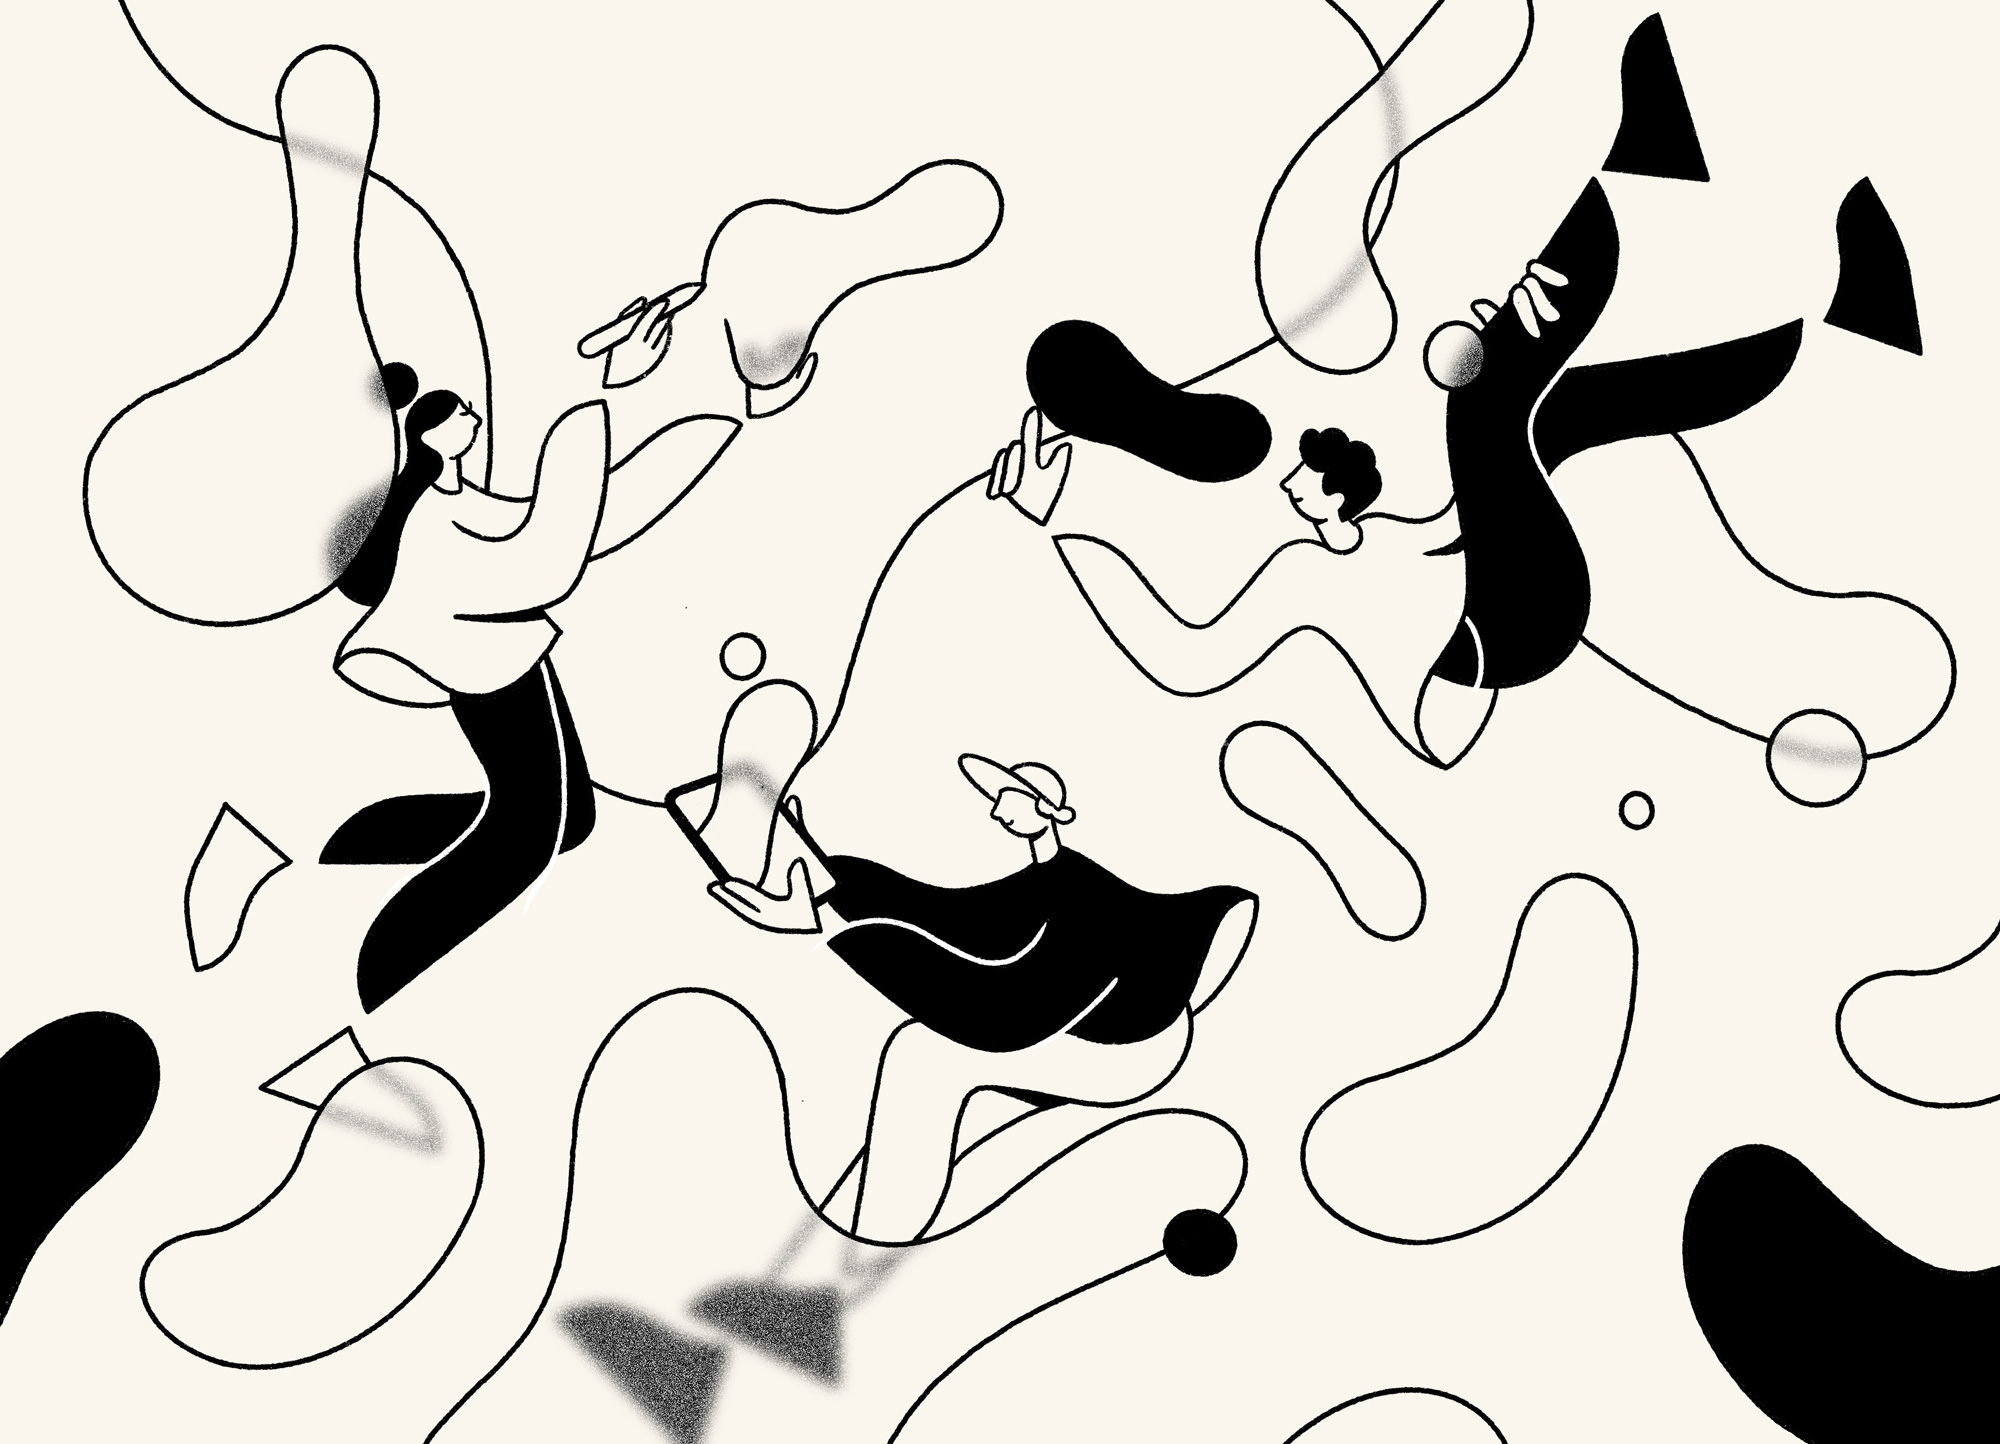 New Logo and Packaging for Paperlike by Daniel Flösser